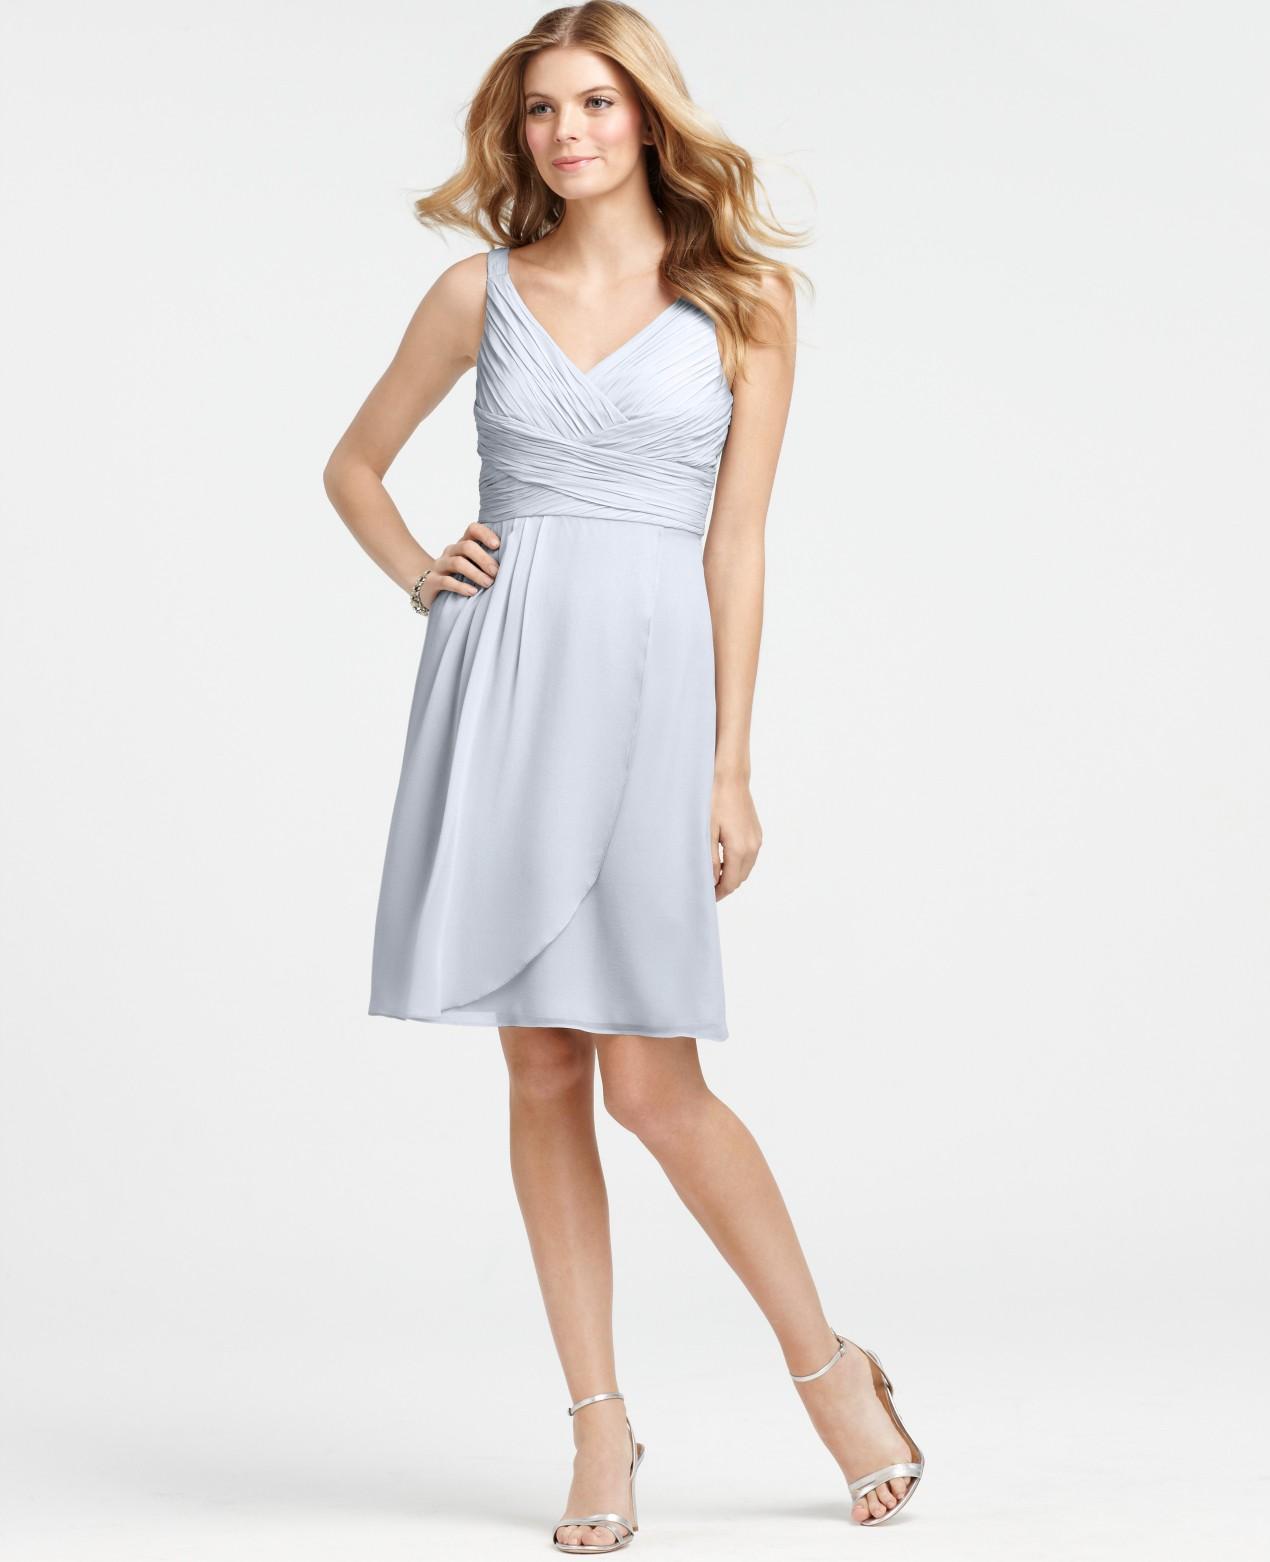 Ann taylor bridesmaid dresses memes for Ann taylor dresses wedding